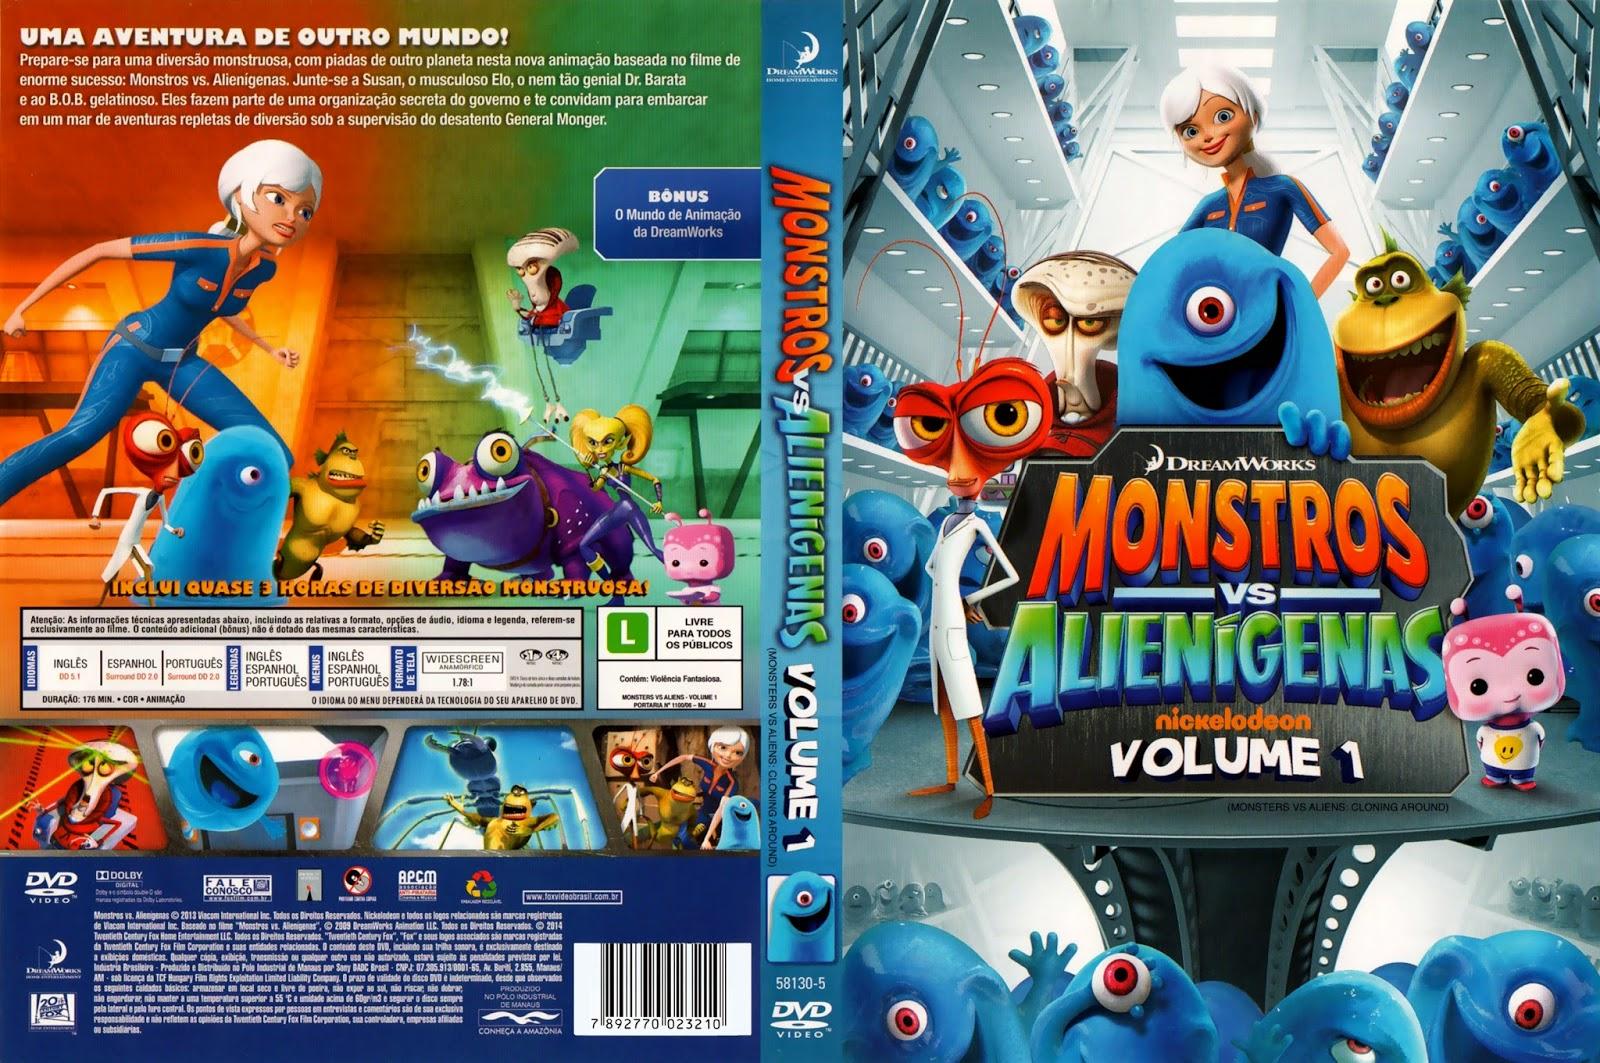 Free monster xxx cartoons adult clips